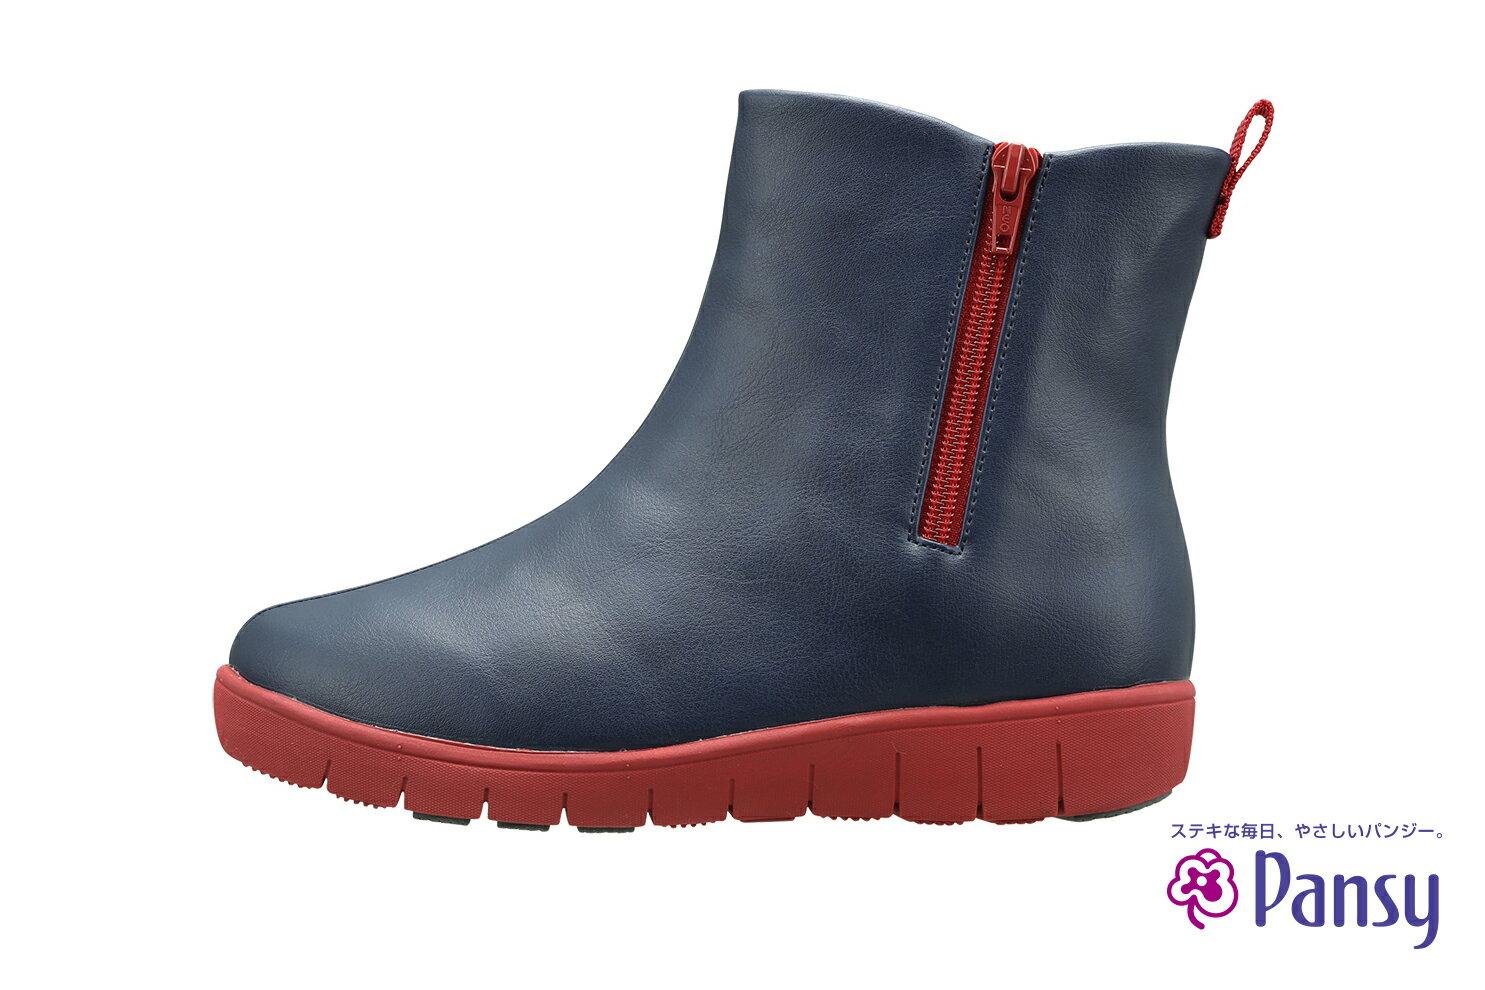 PANSY 女性 時尚撞色 短筒雨鞋 QA4944 1